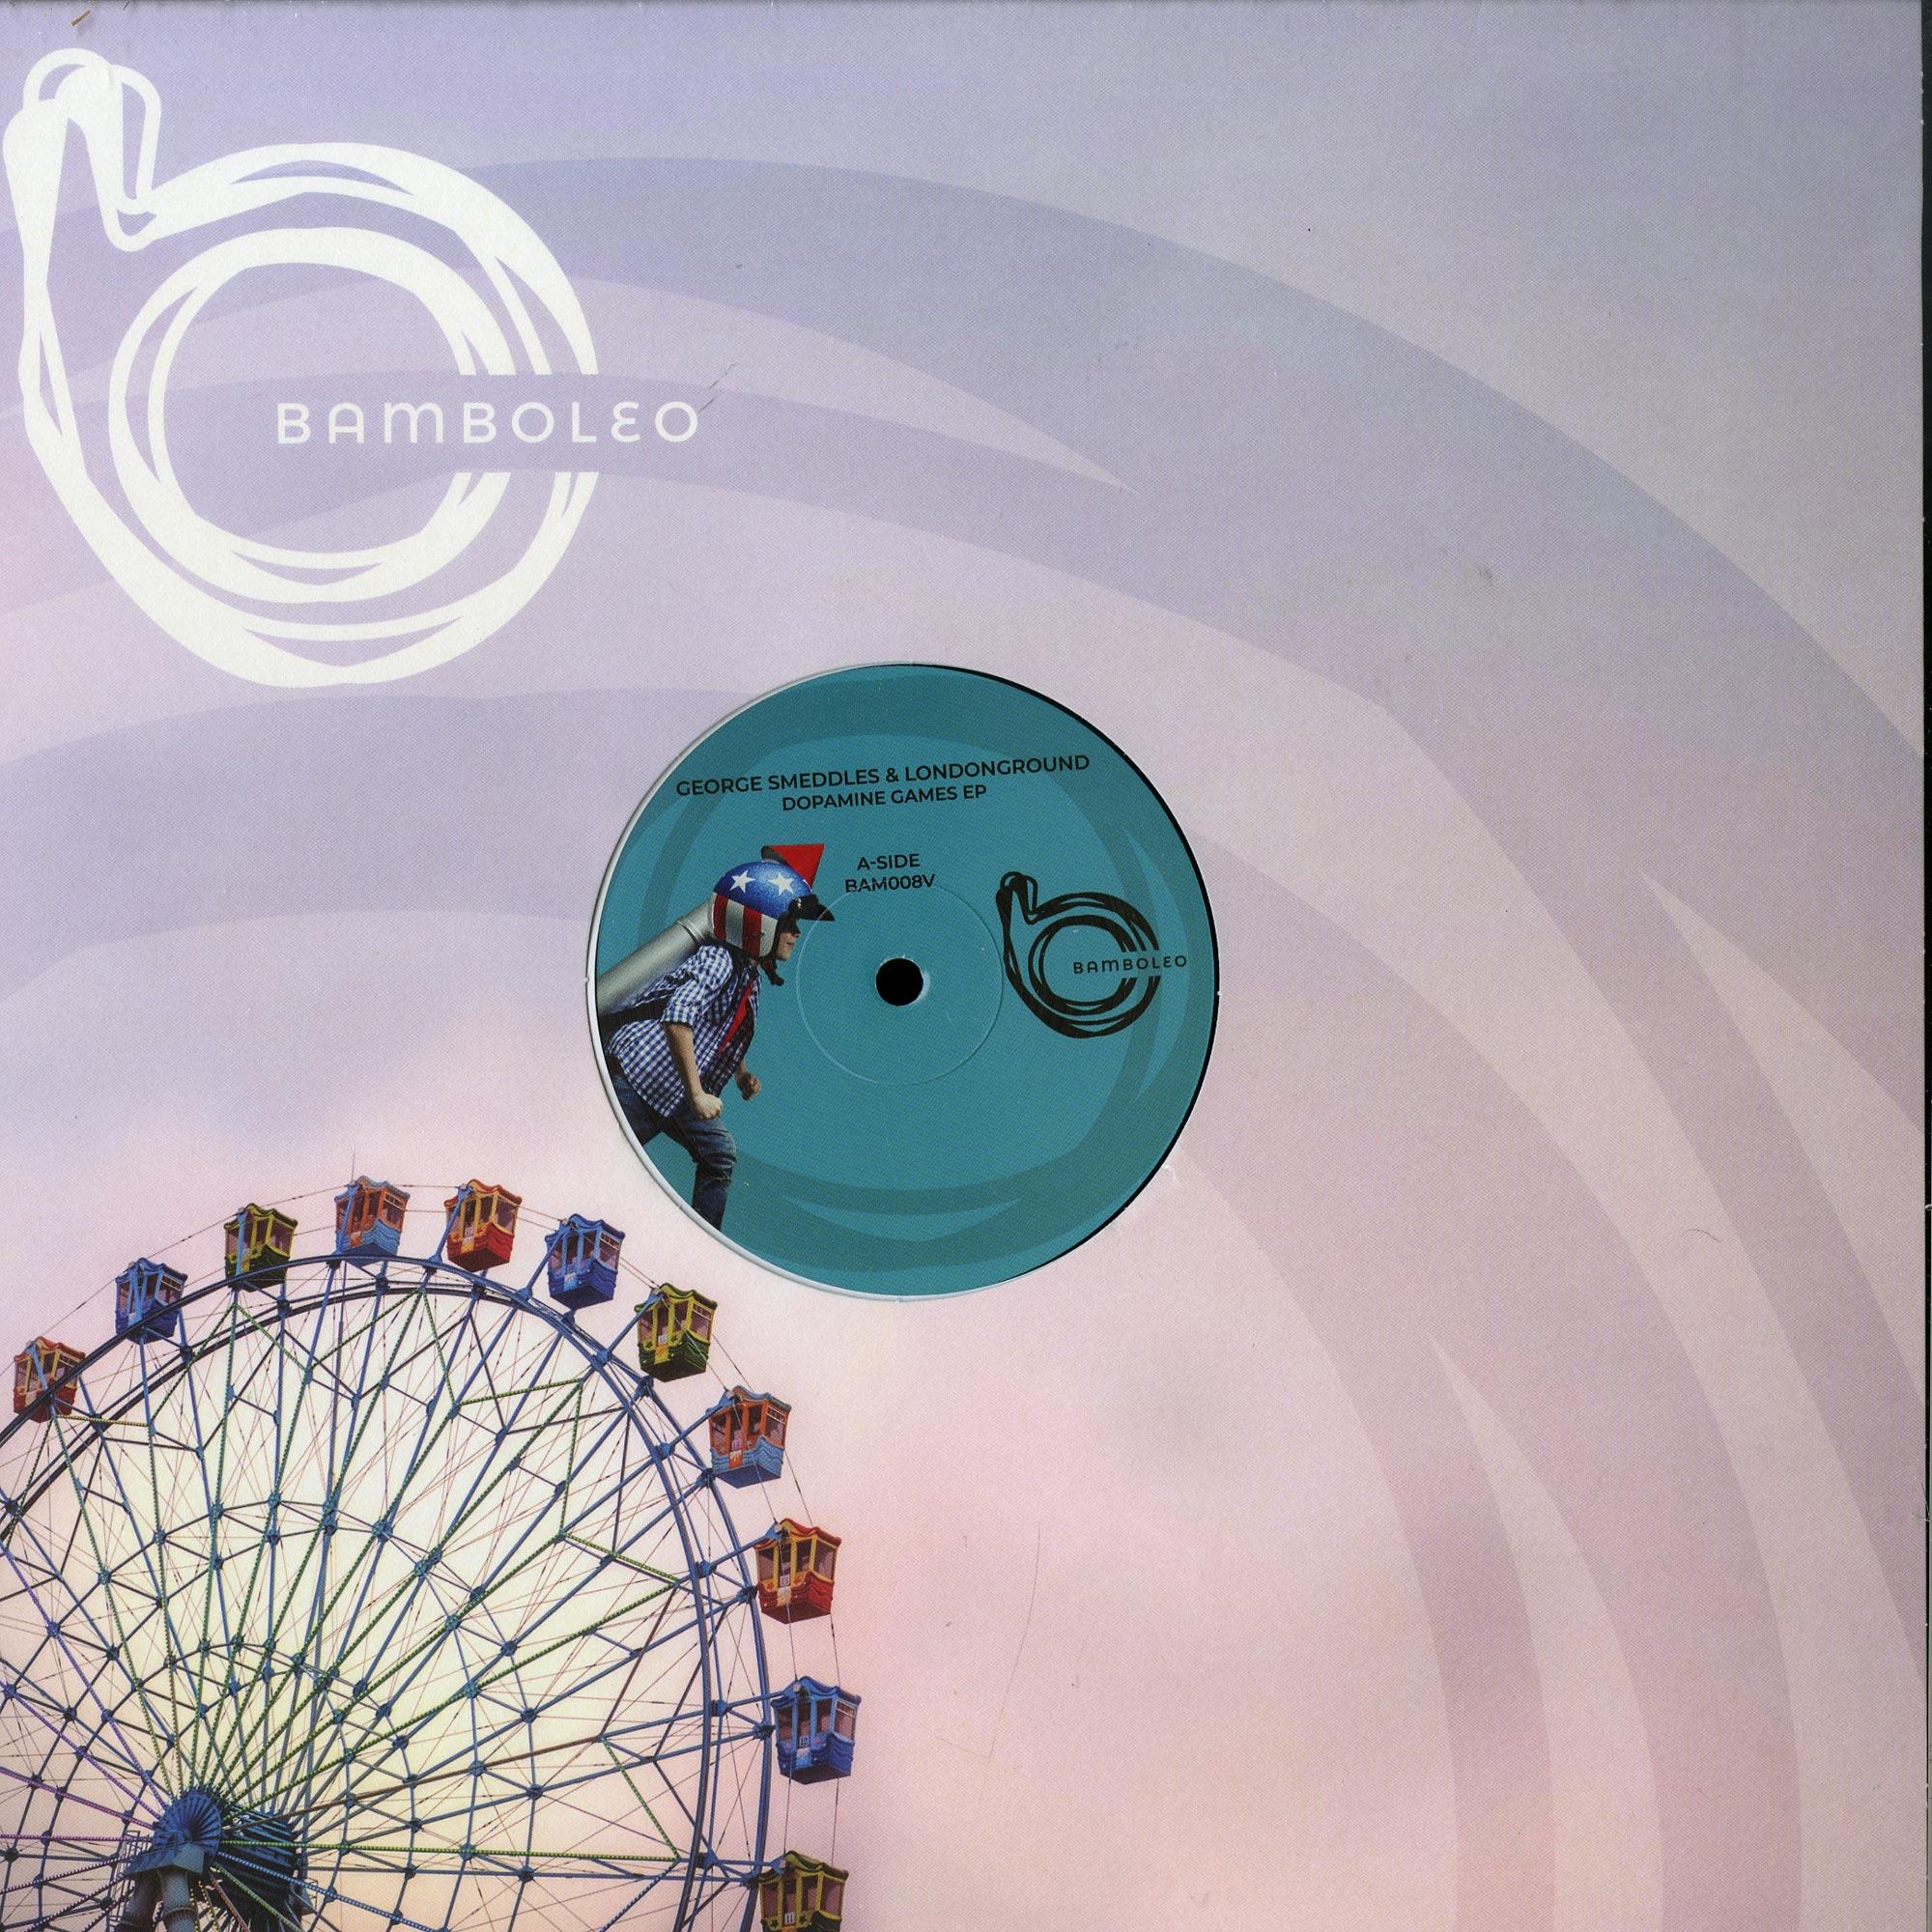 George Smeddles, LondonGround - DOPAMINE GAMES EP